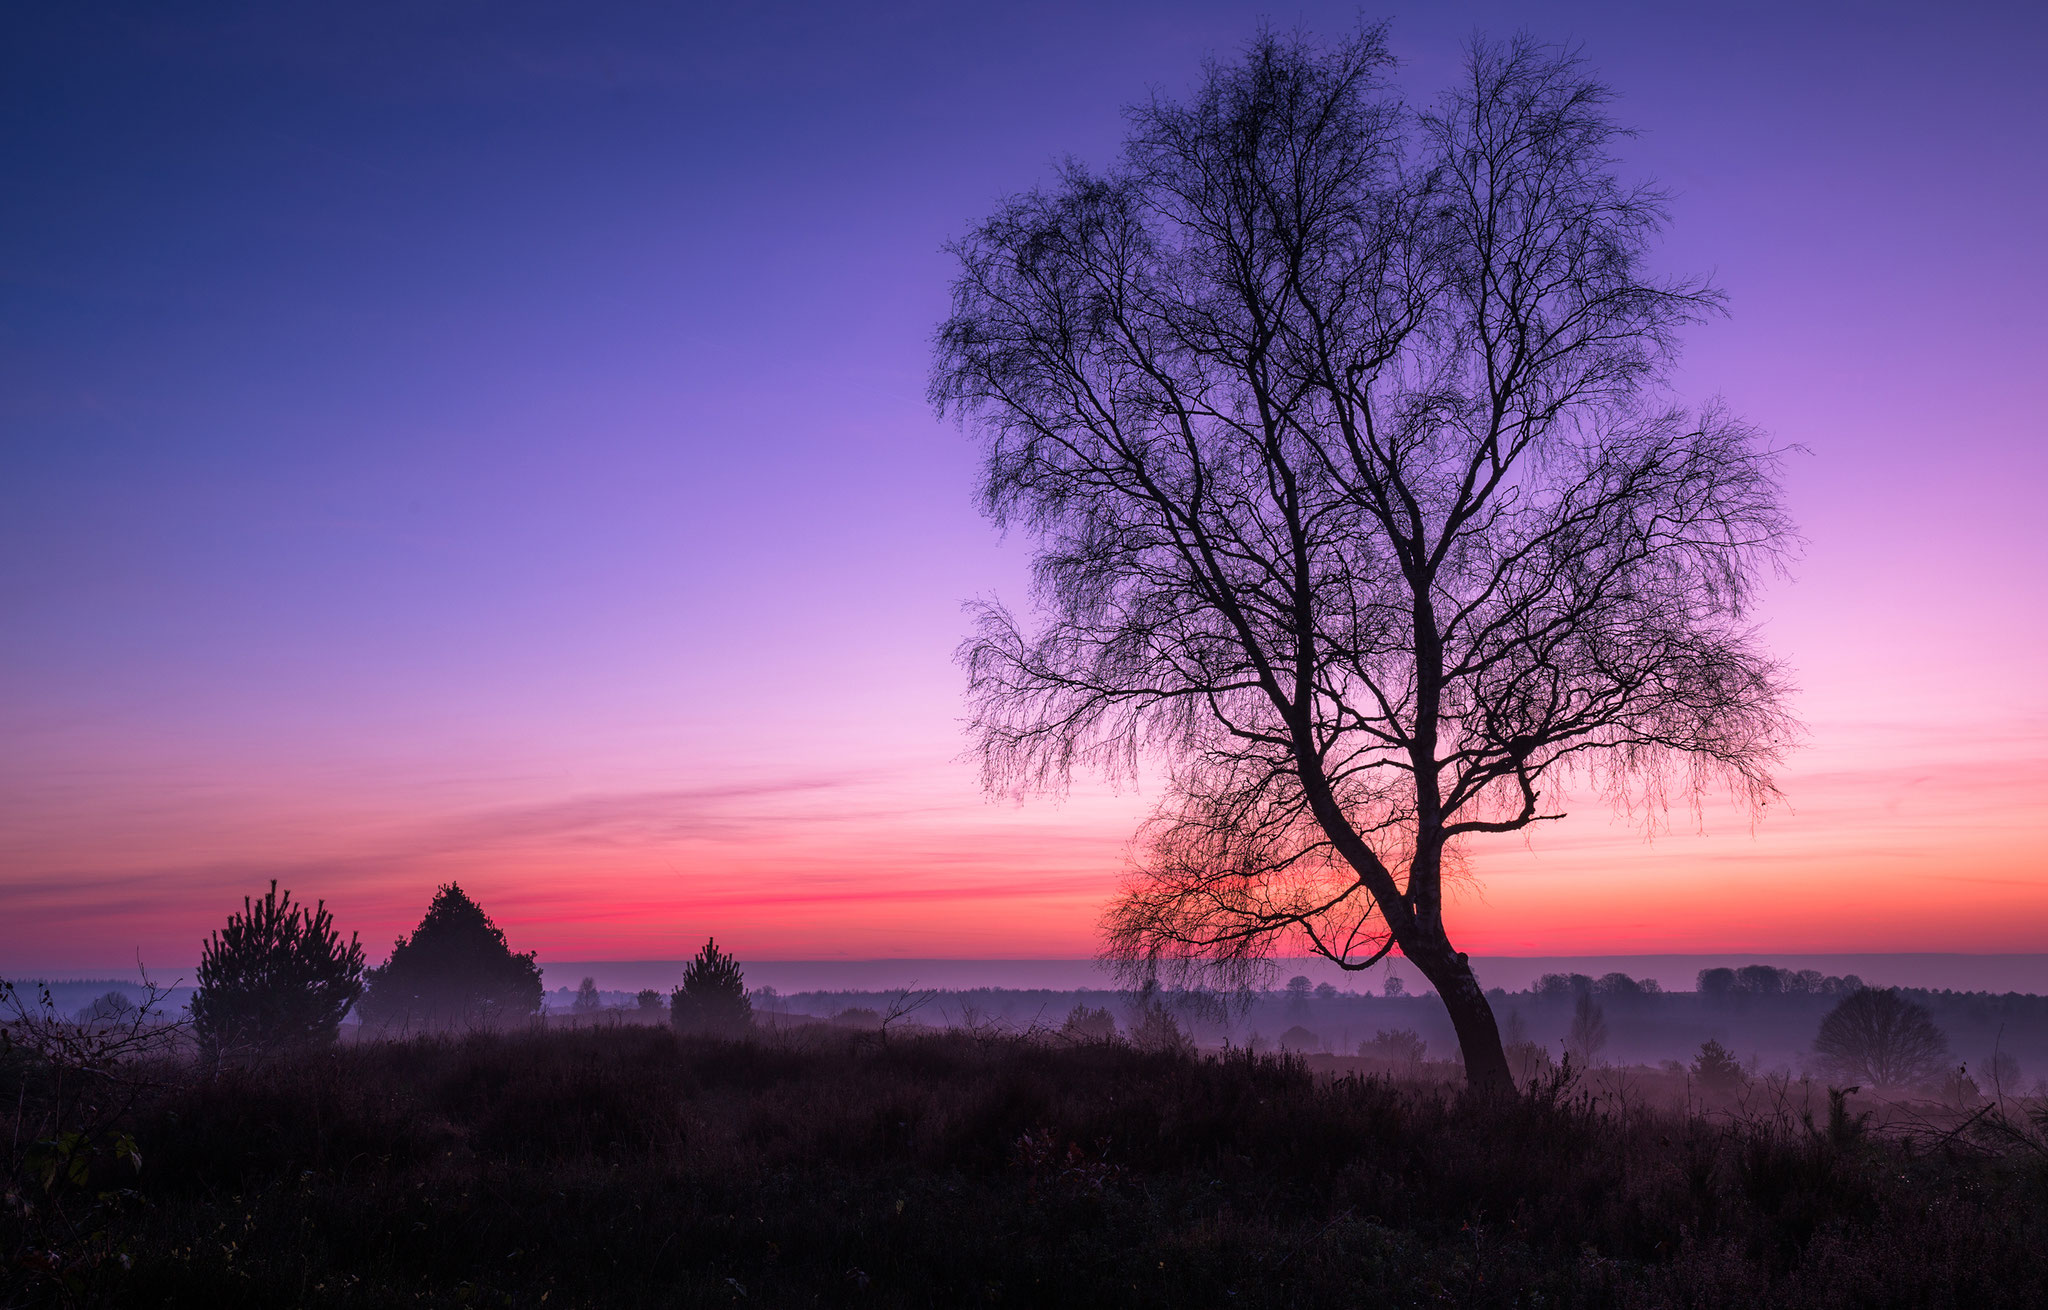 Dutch national park Sallandse heuvelrug, Martijn van Steenbergen, © 2018